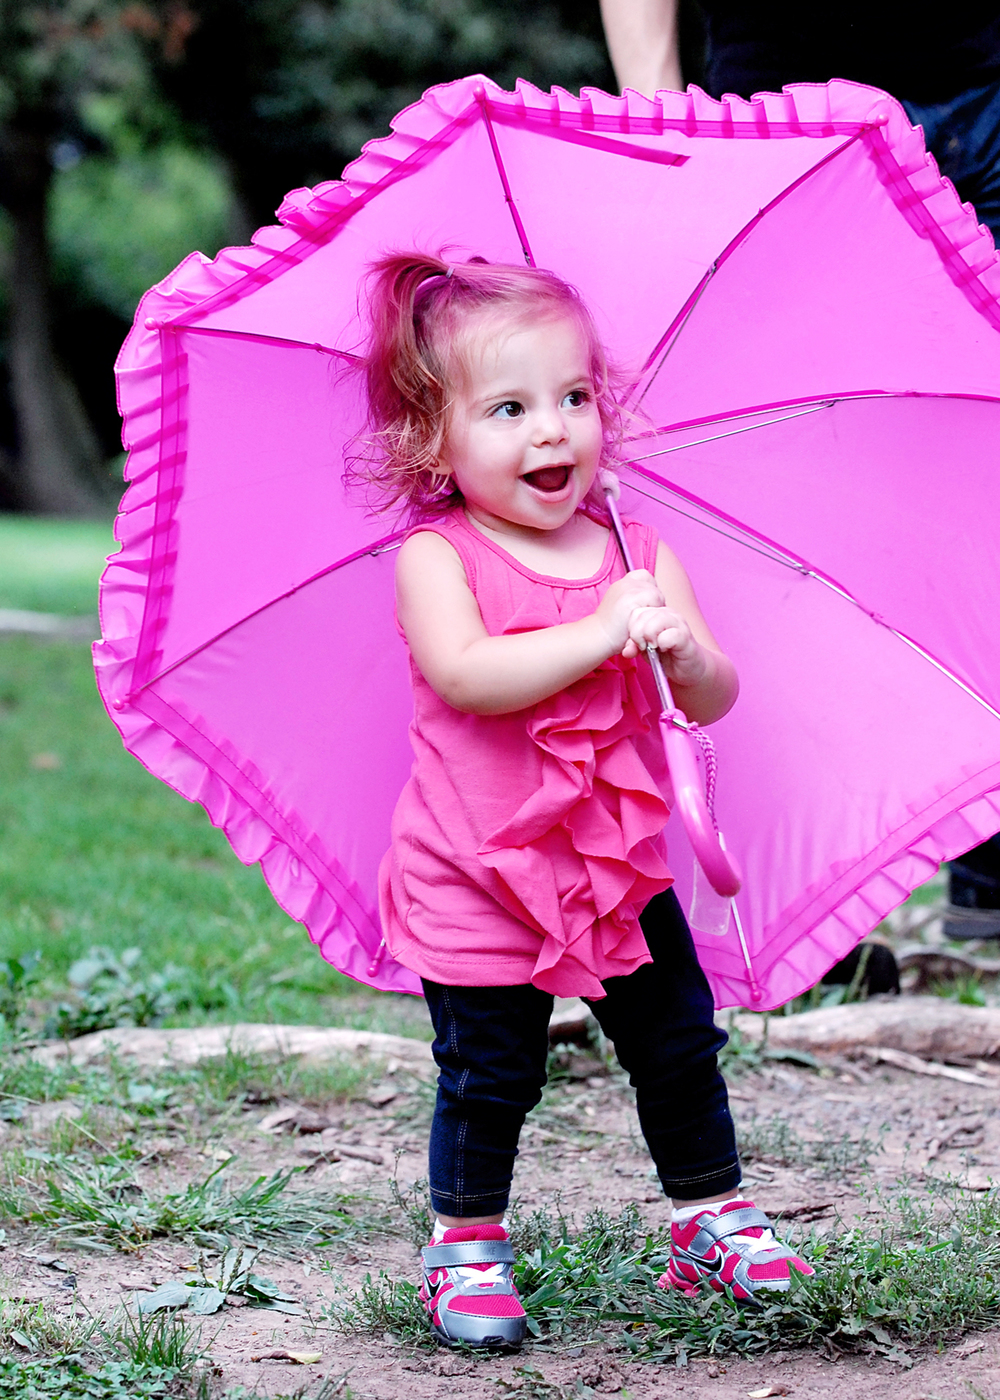 _DSC0569 tess with pink umbrella color.jpg